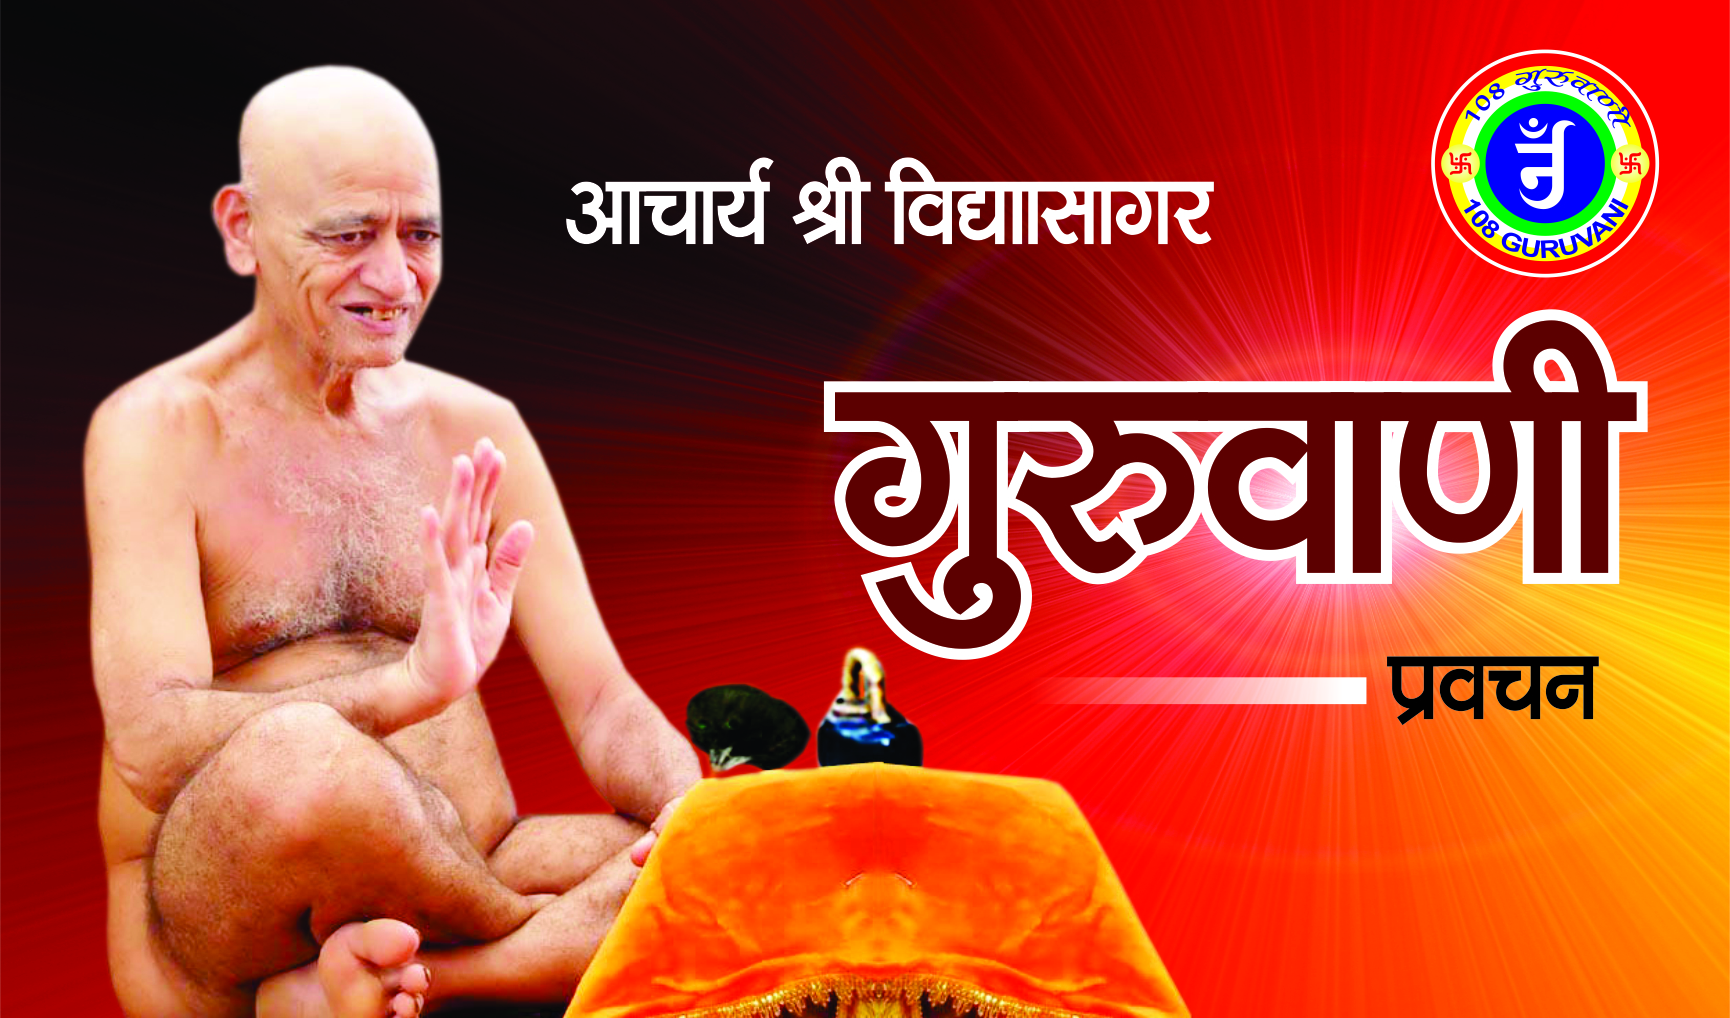 108 guruvani banner 2